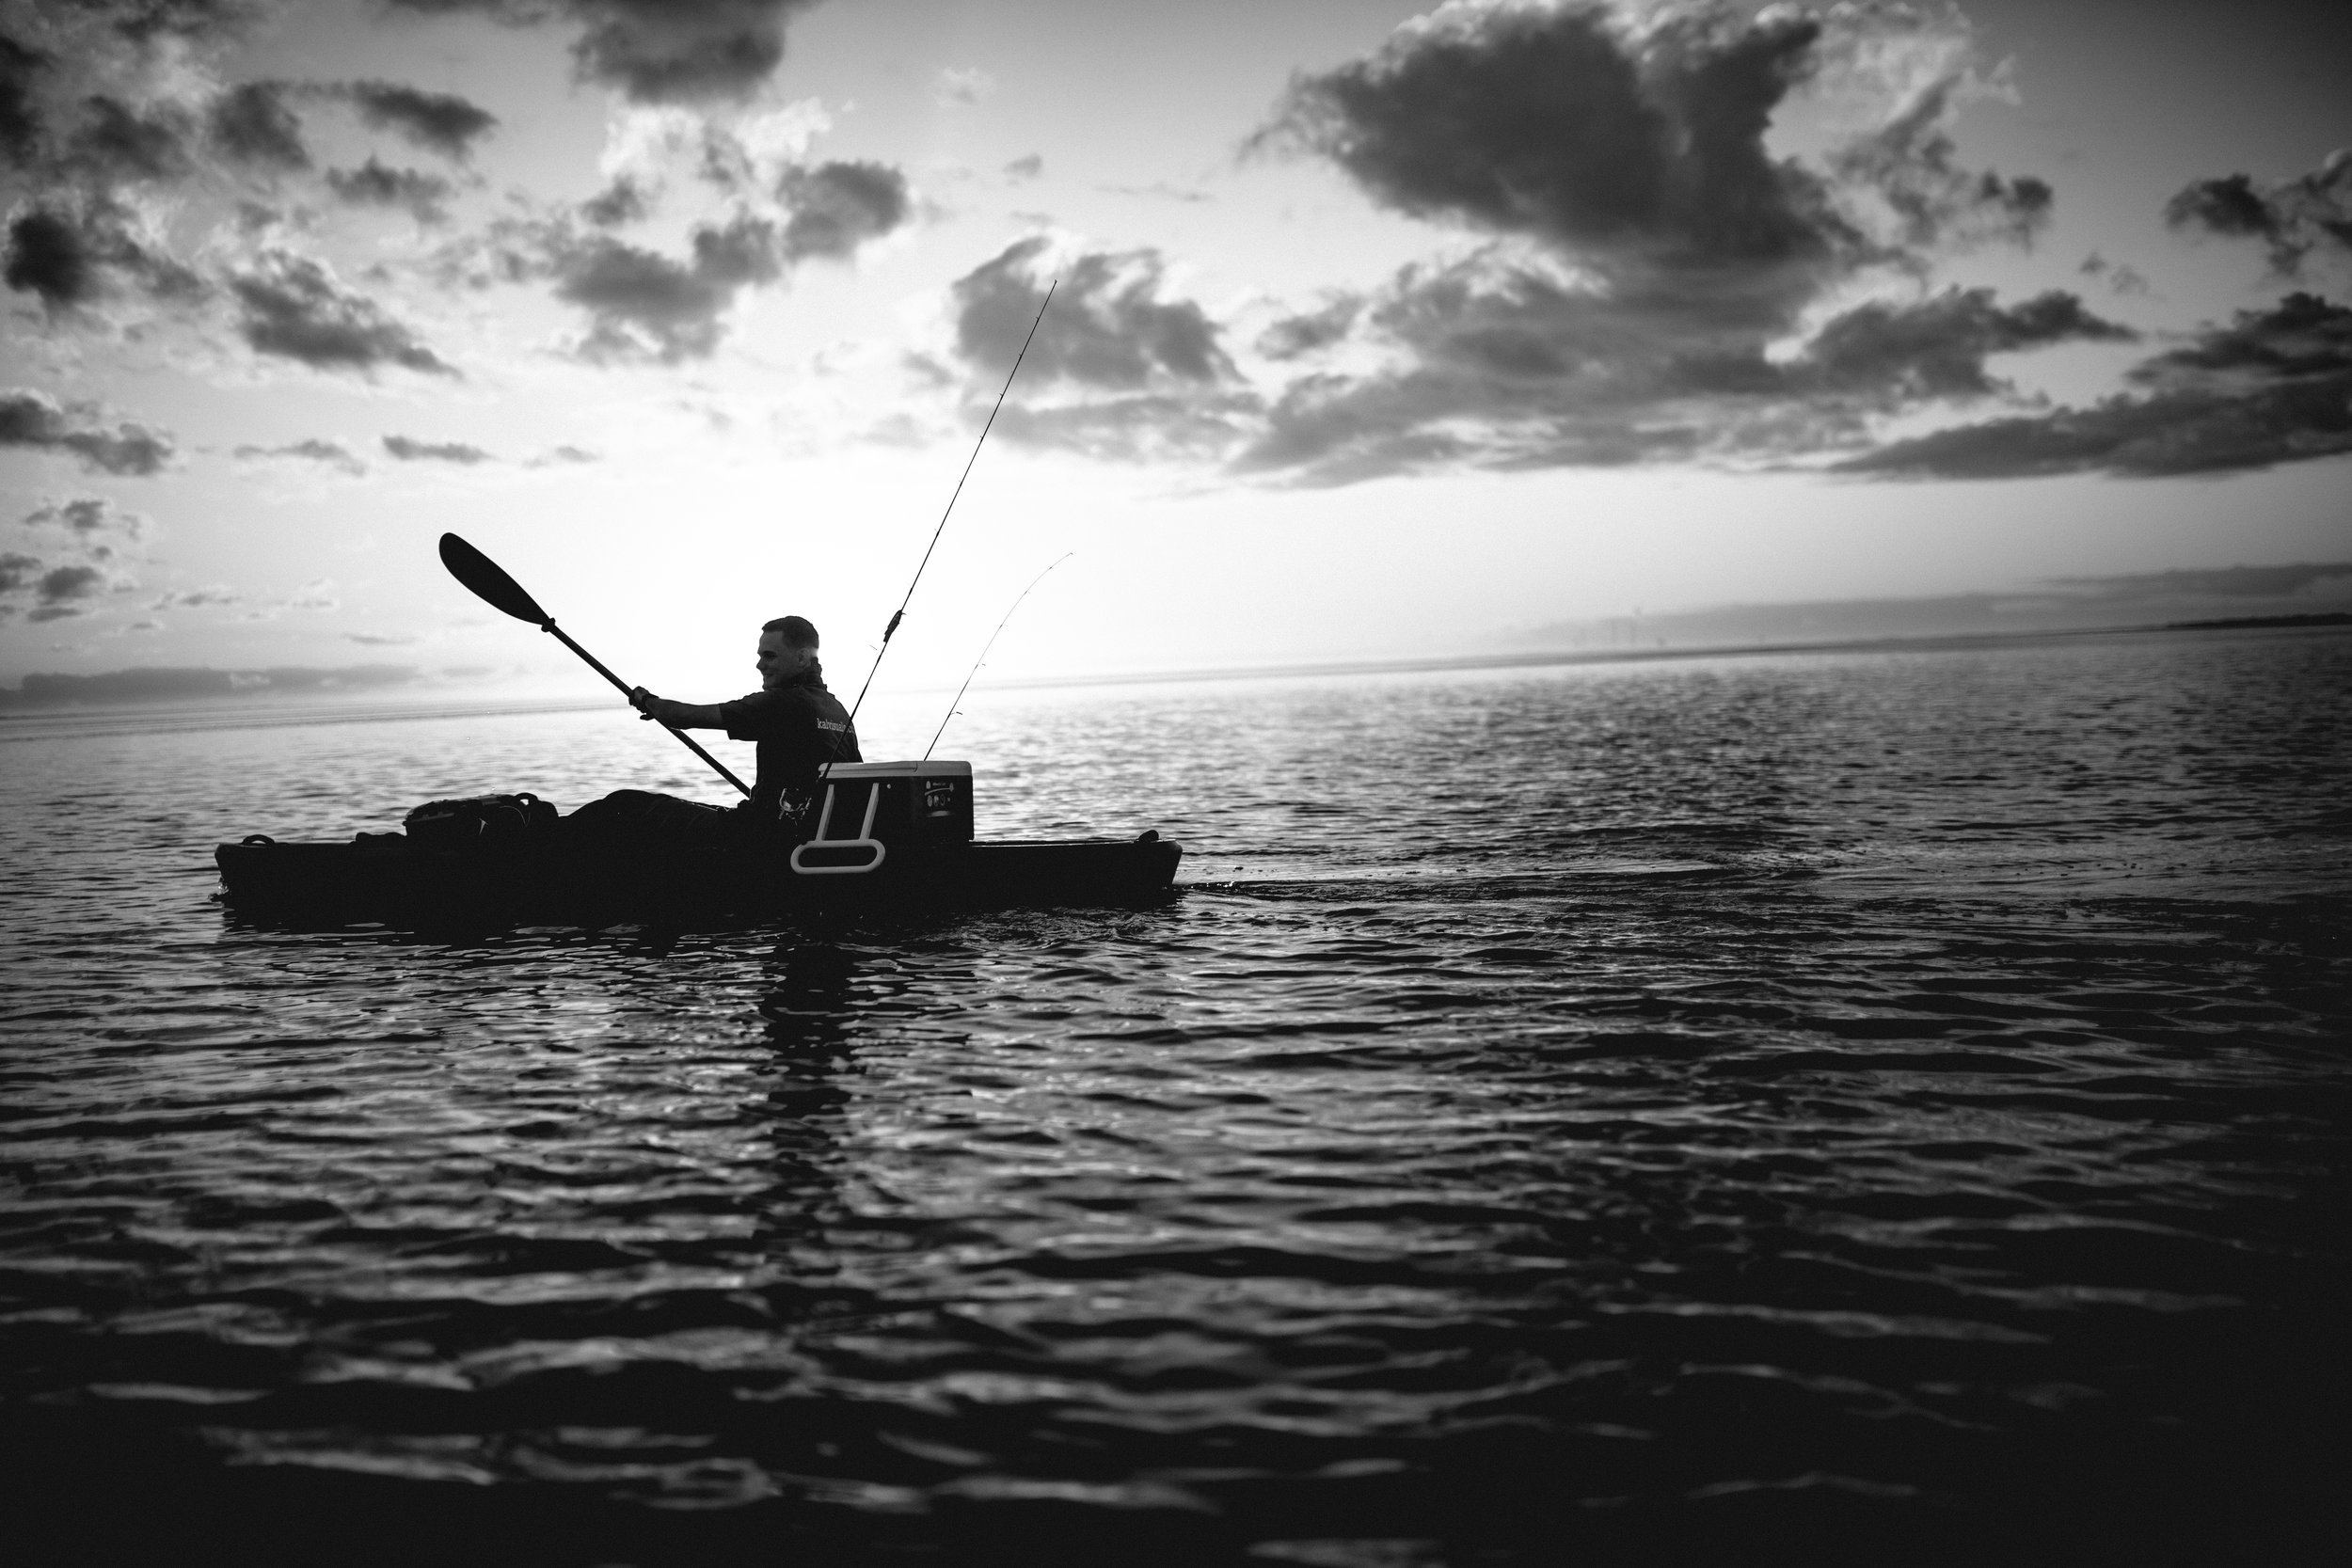 mosquito-lagoon-florida-canoeing